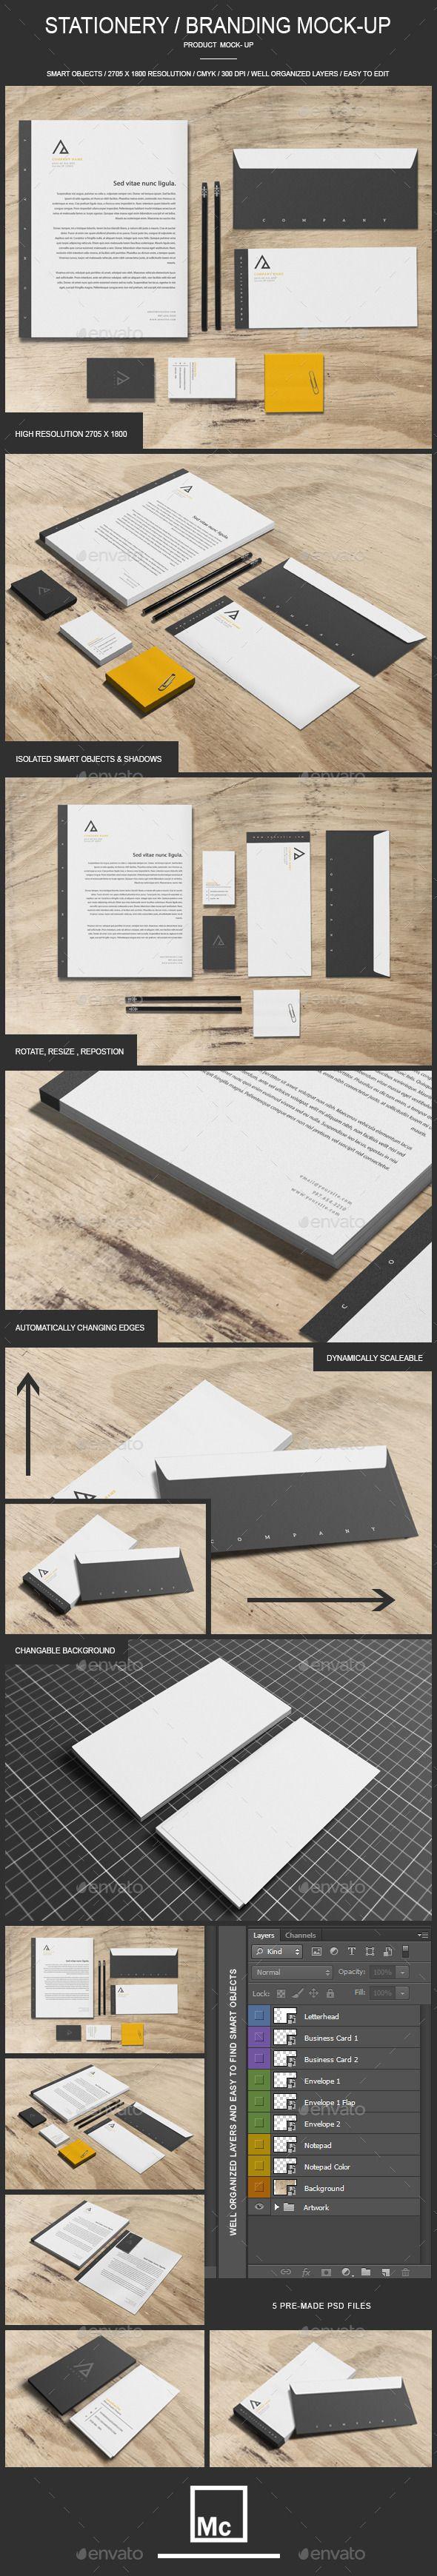 Stationery / Branding - Mock-Up (Stationery)